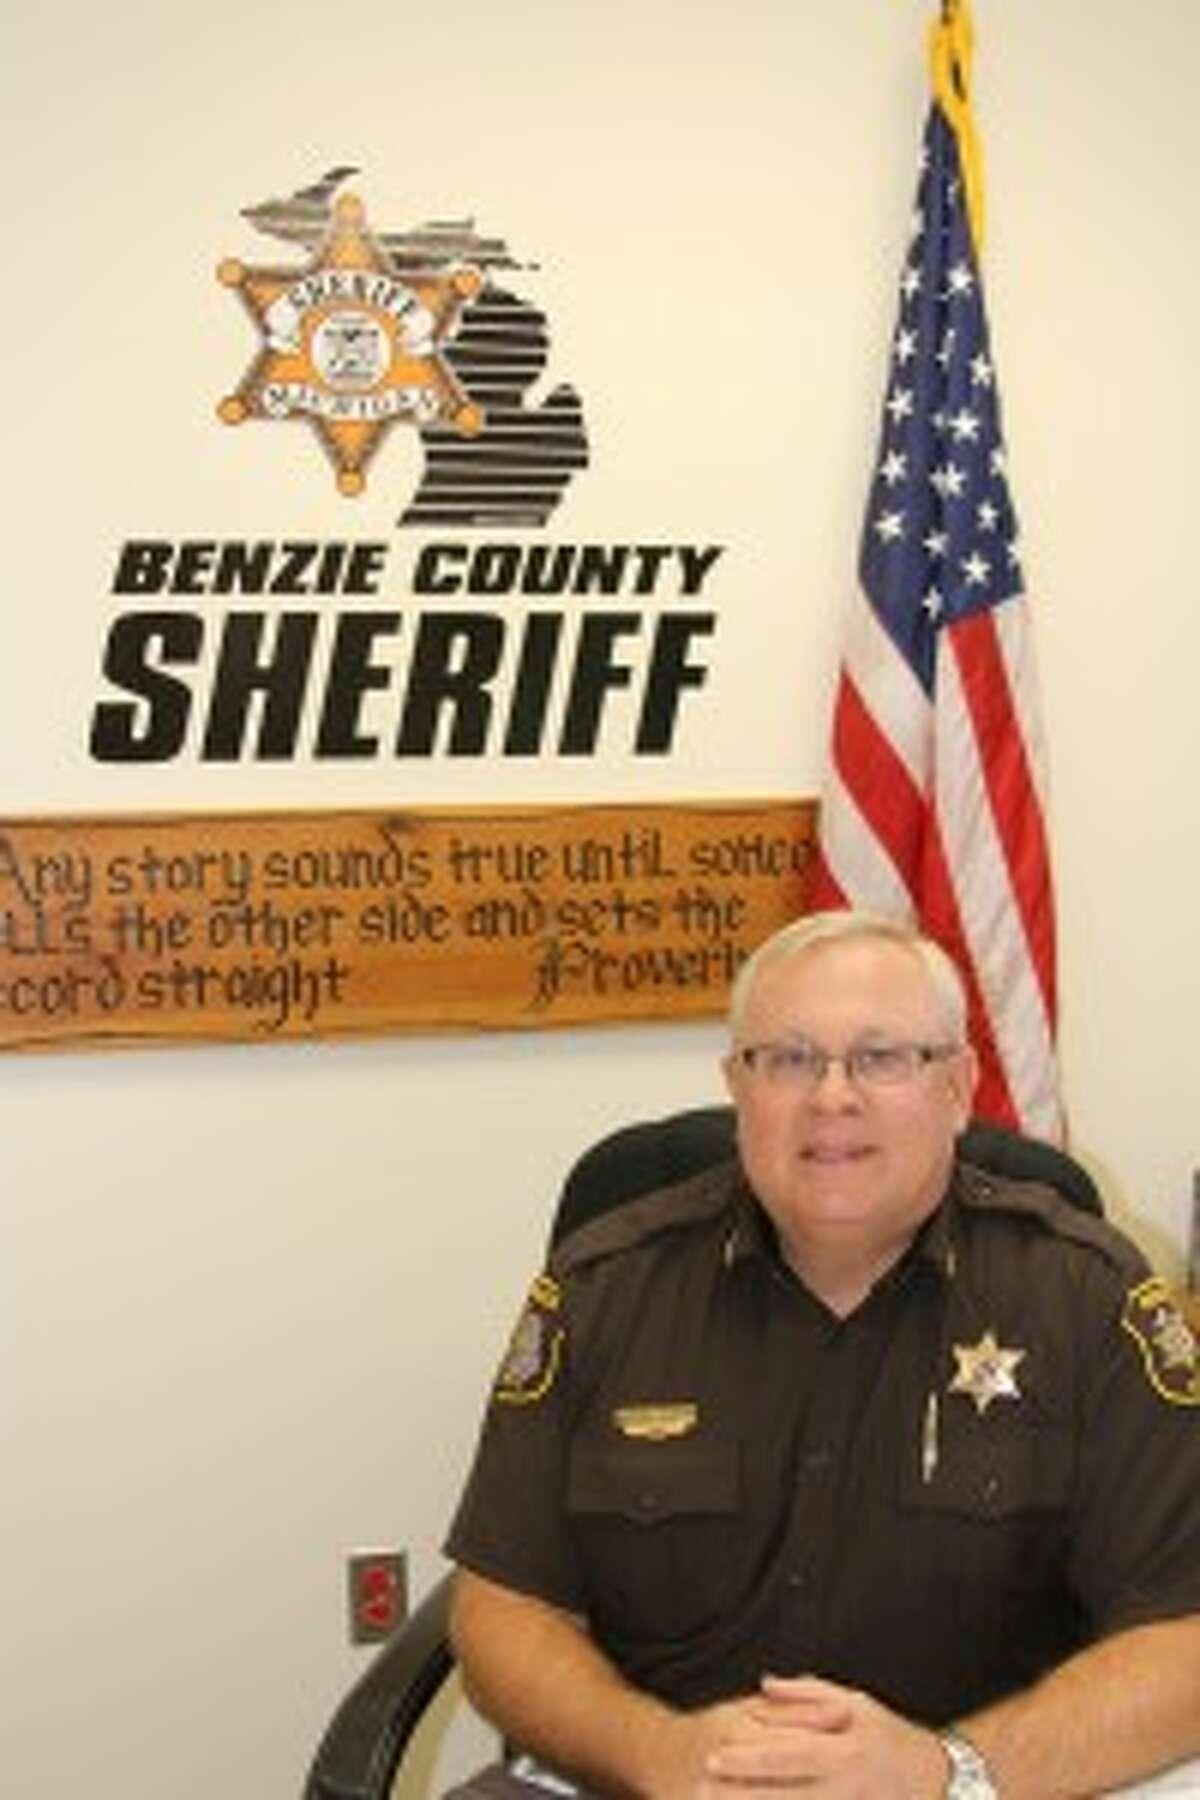 Benzie County Sheriff Ted Schendel